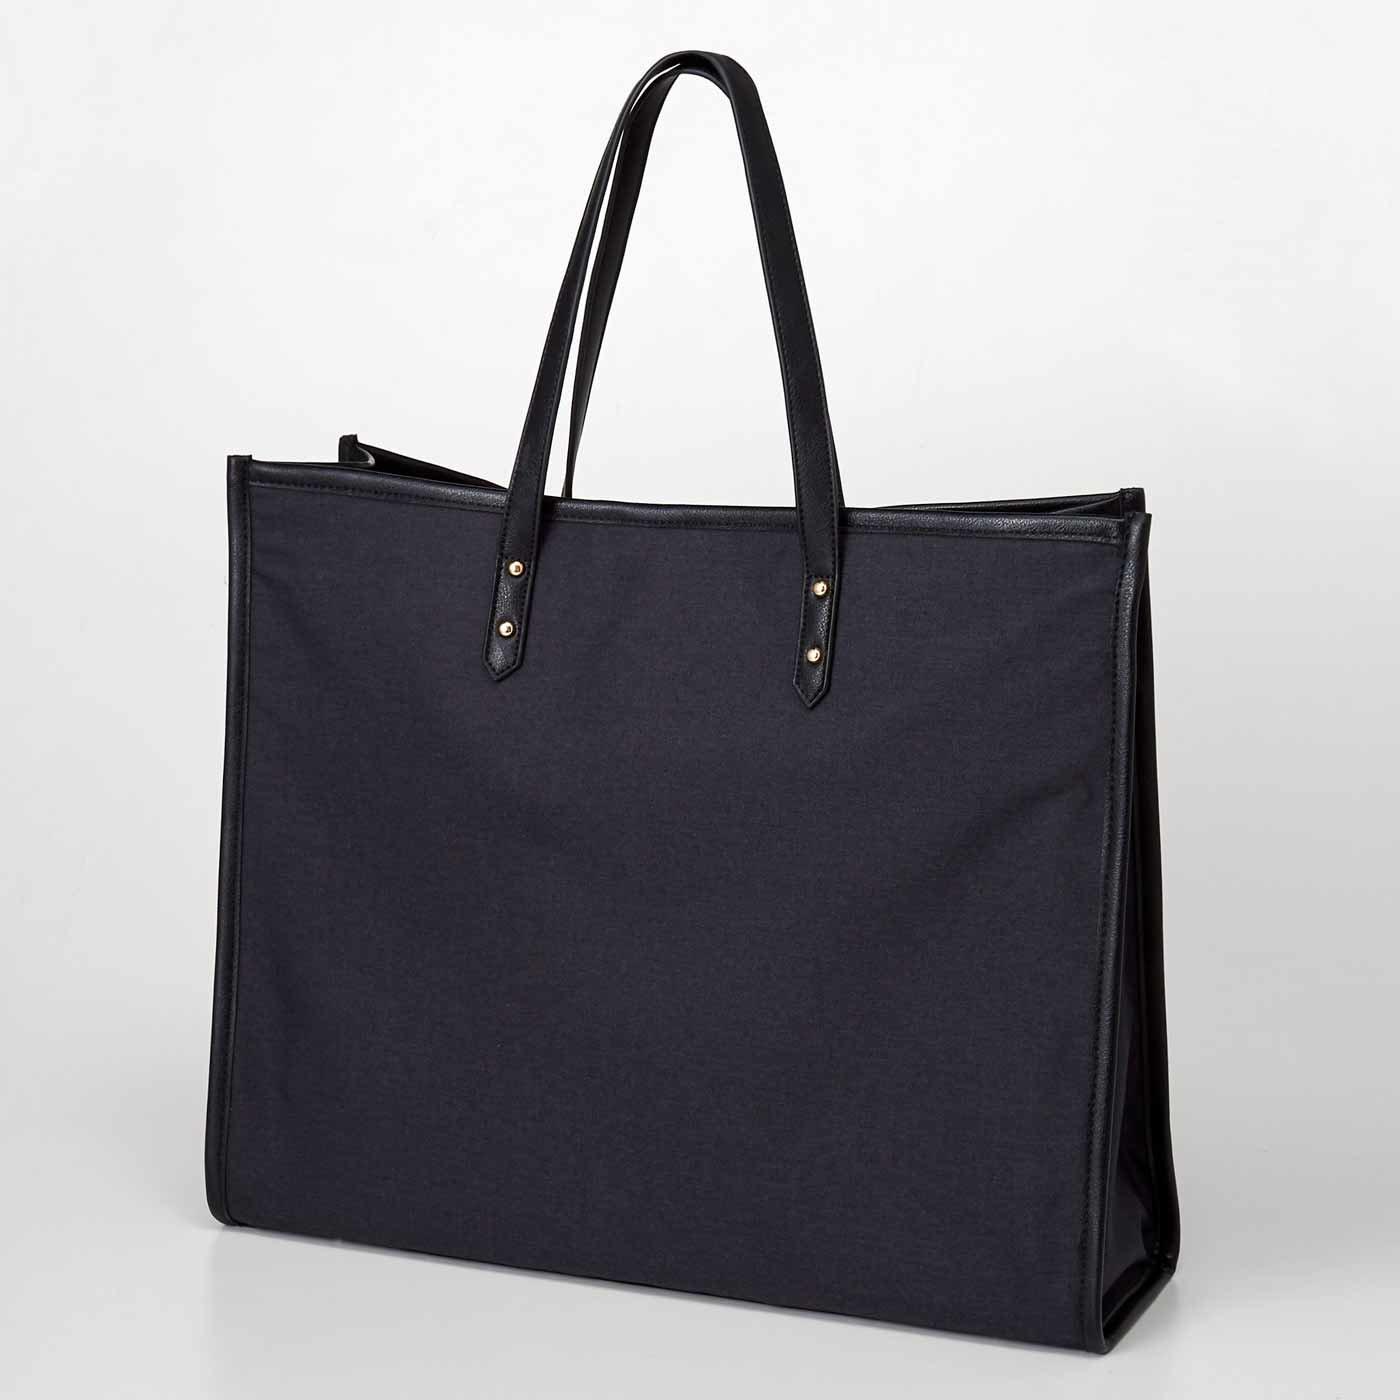 OSYAIRO ジャンボうちわが入るパイピングトートバッグ〈ブラック〉